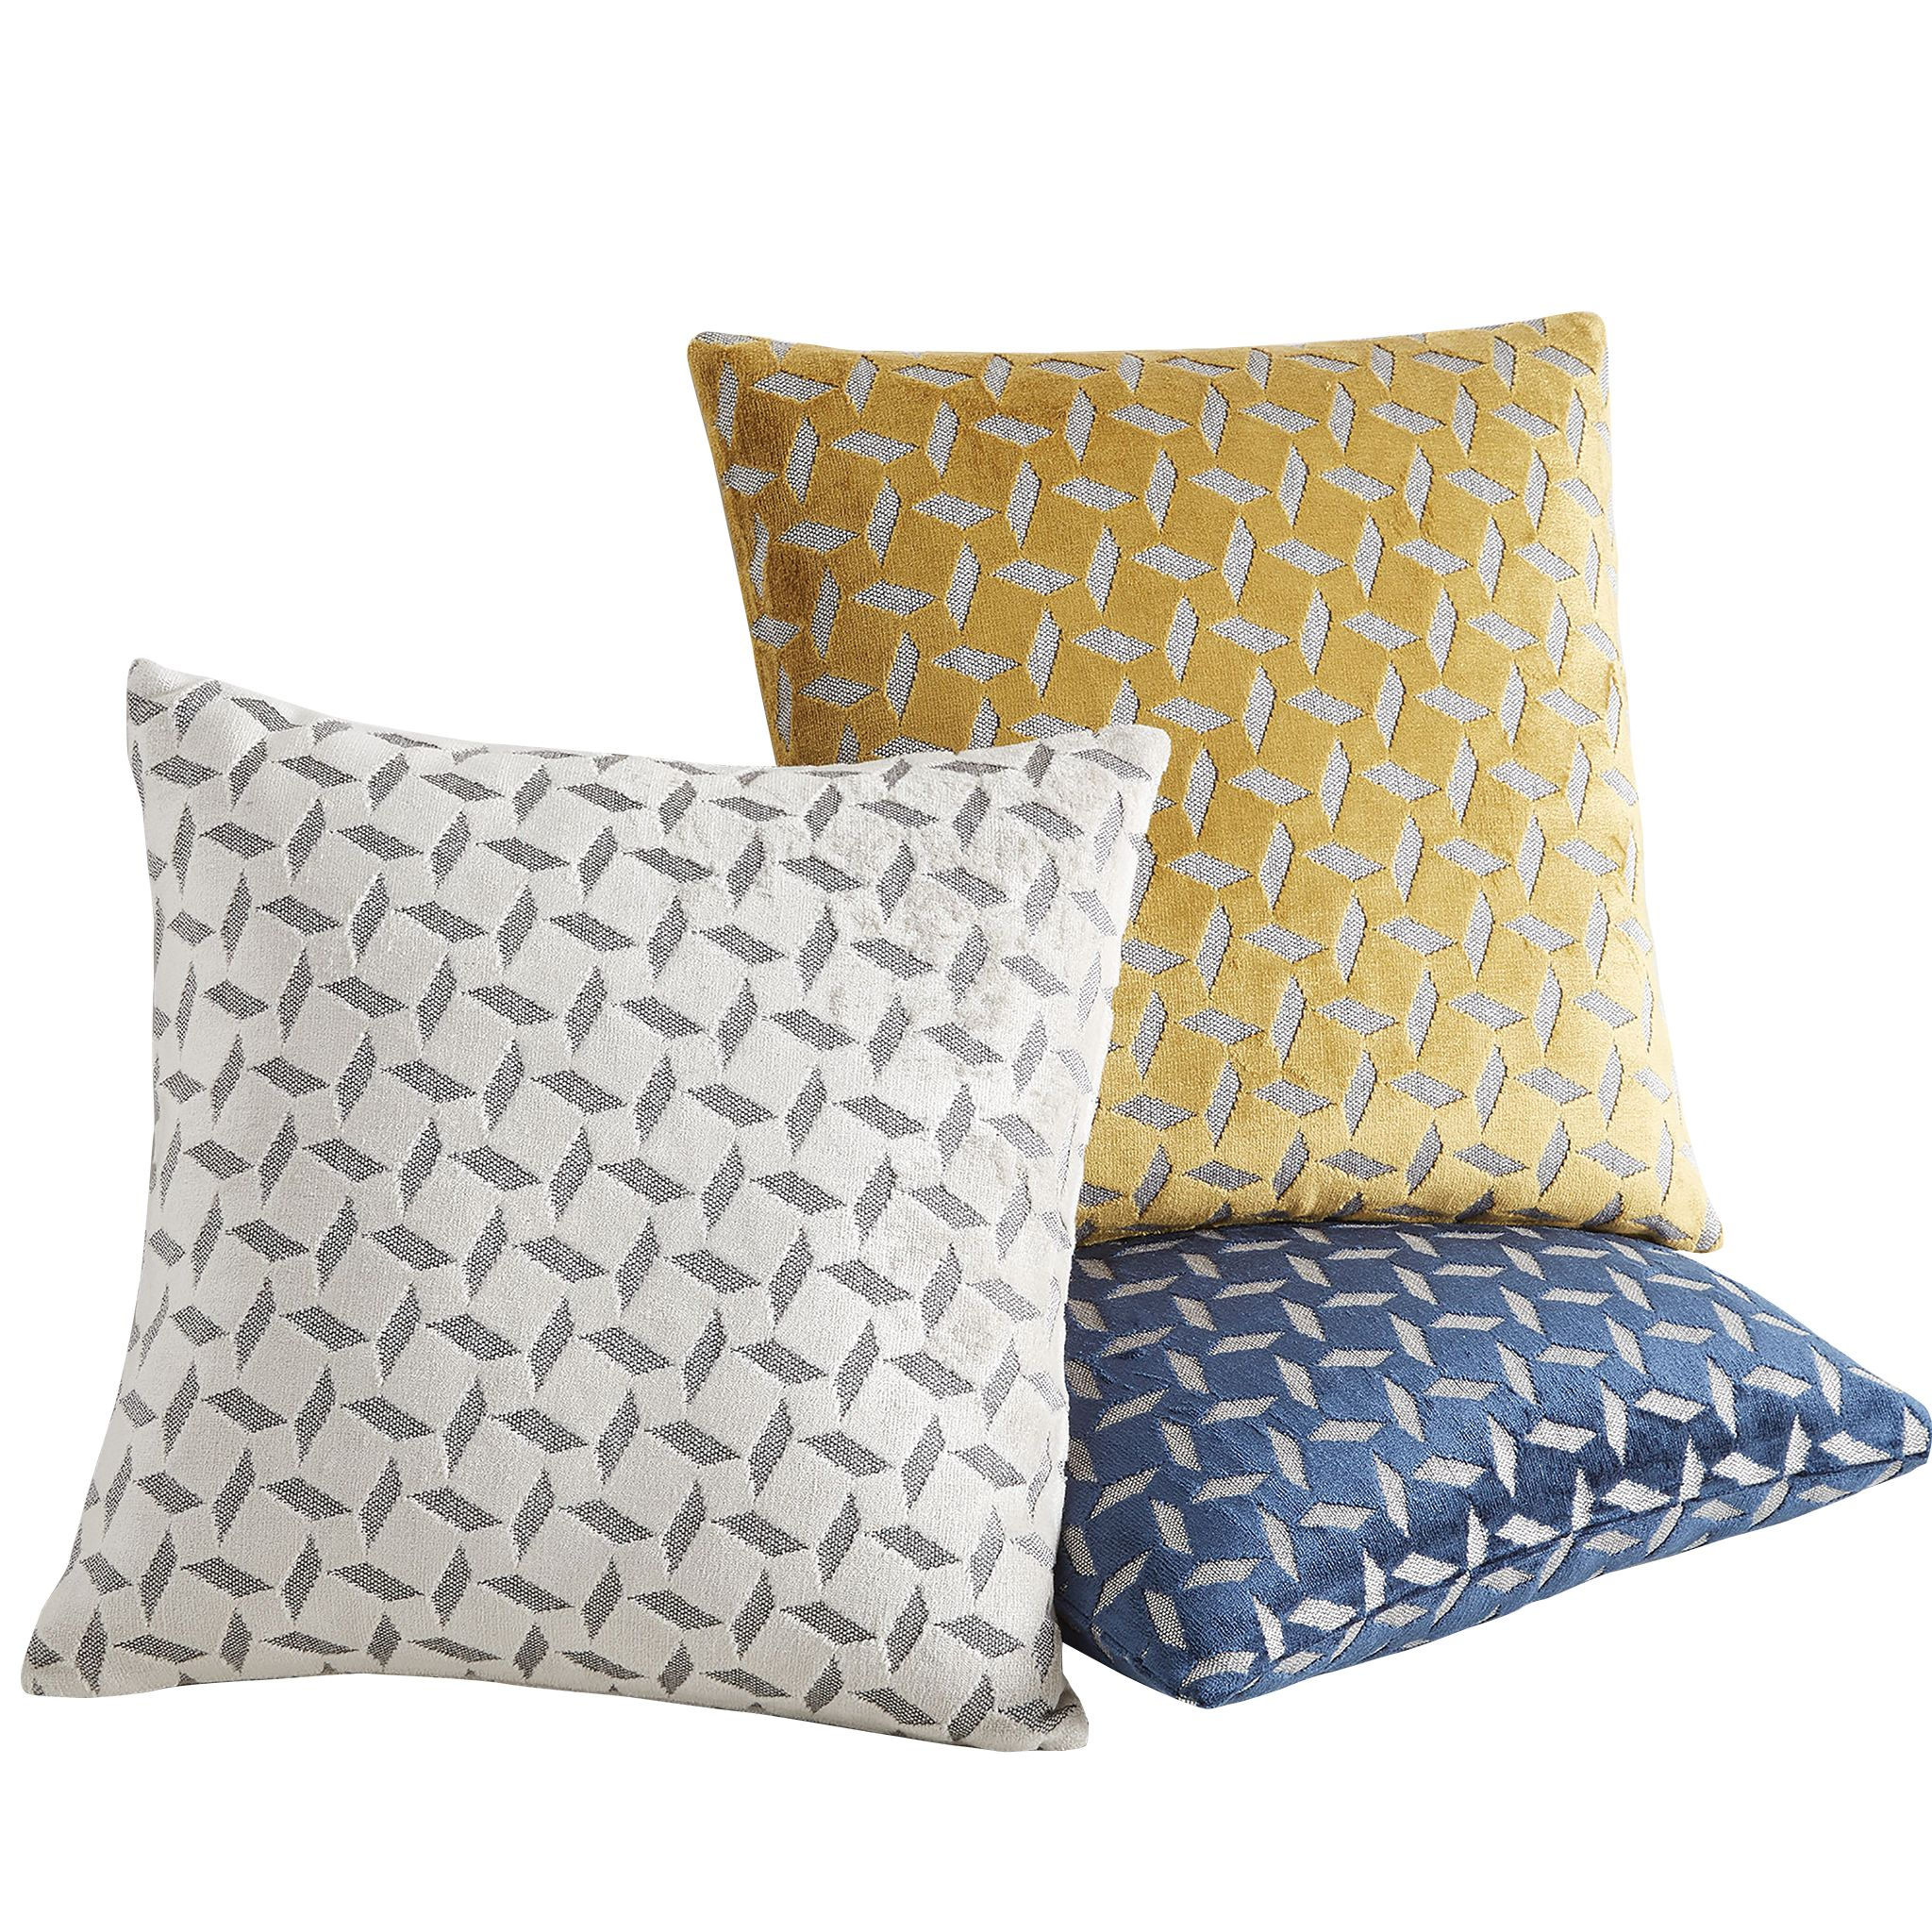 Pinwheel jacquard velvet pillow covers by West Elm